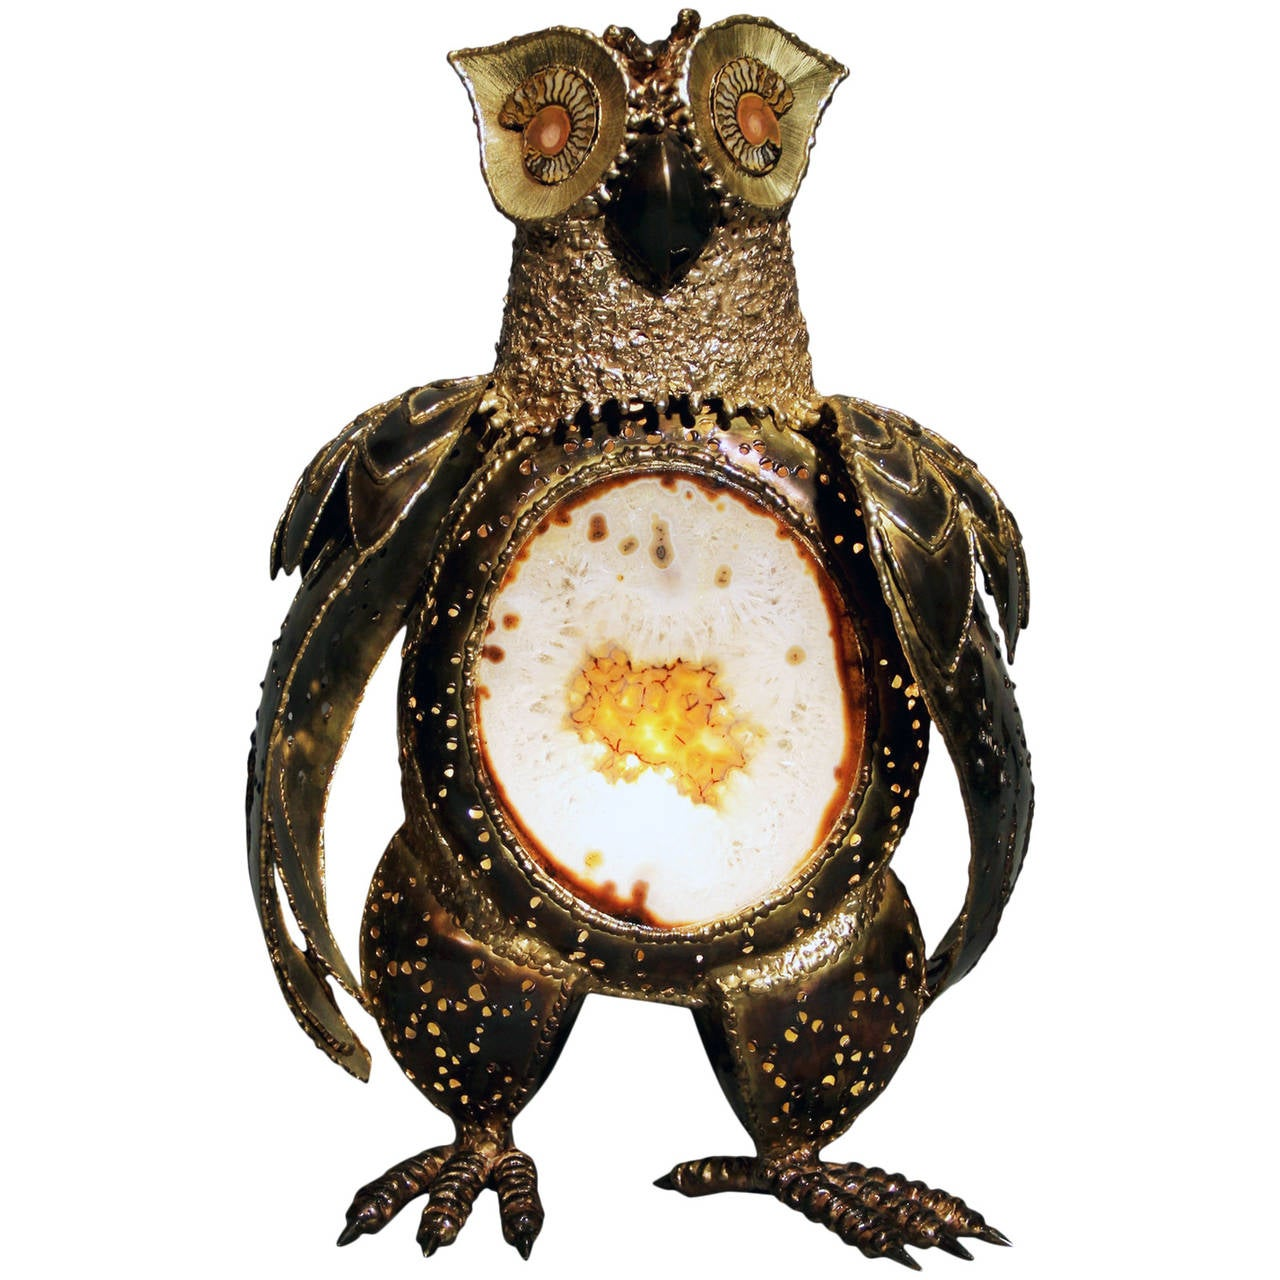 "Luminous Sculpture ""Owl"" by Richard Faure"